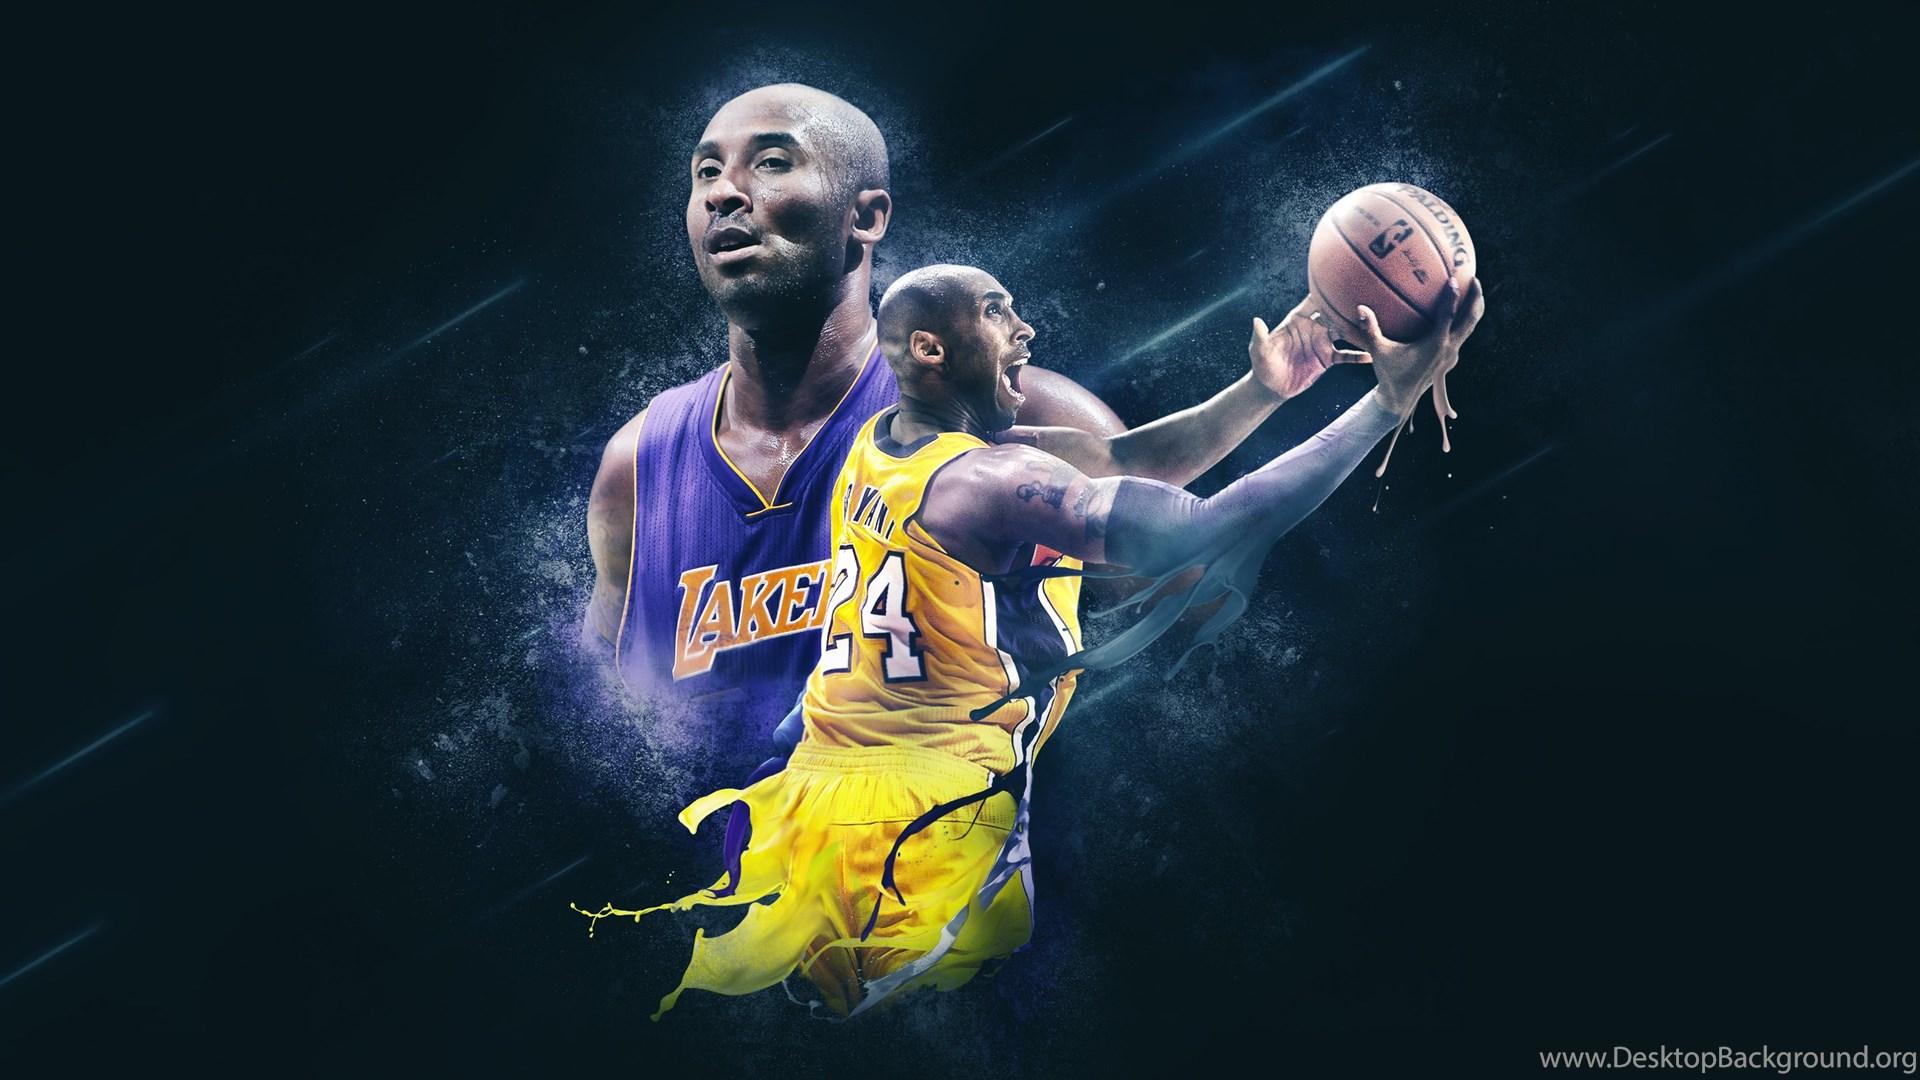 Kobe Bryant Hd Wallpapers By Sanoinoi On Deviantart Desktop Background